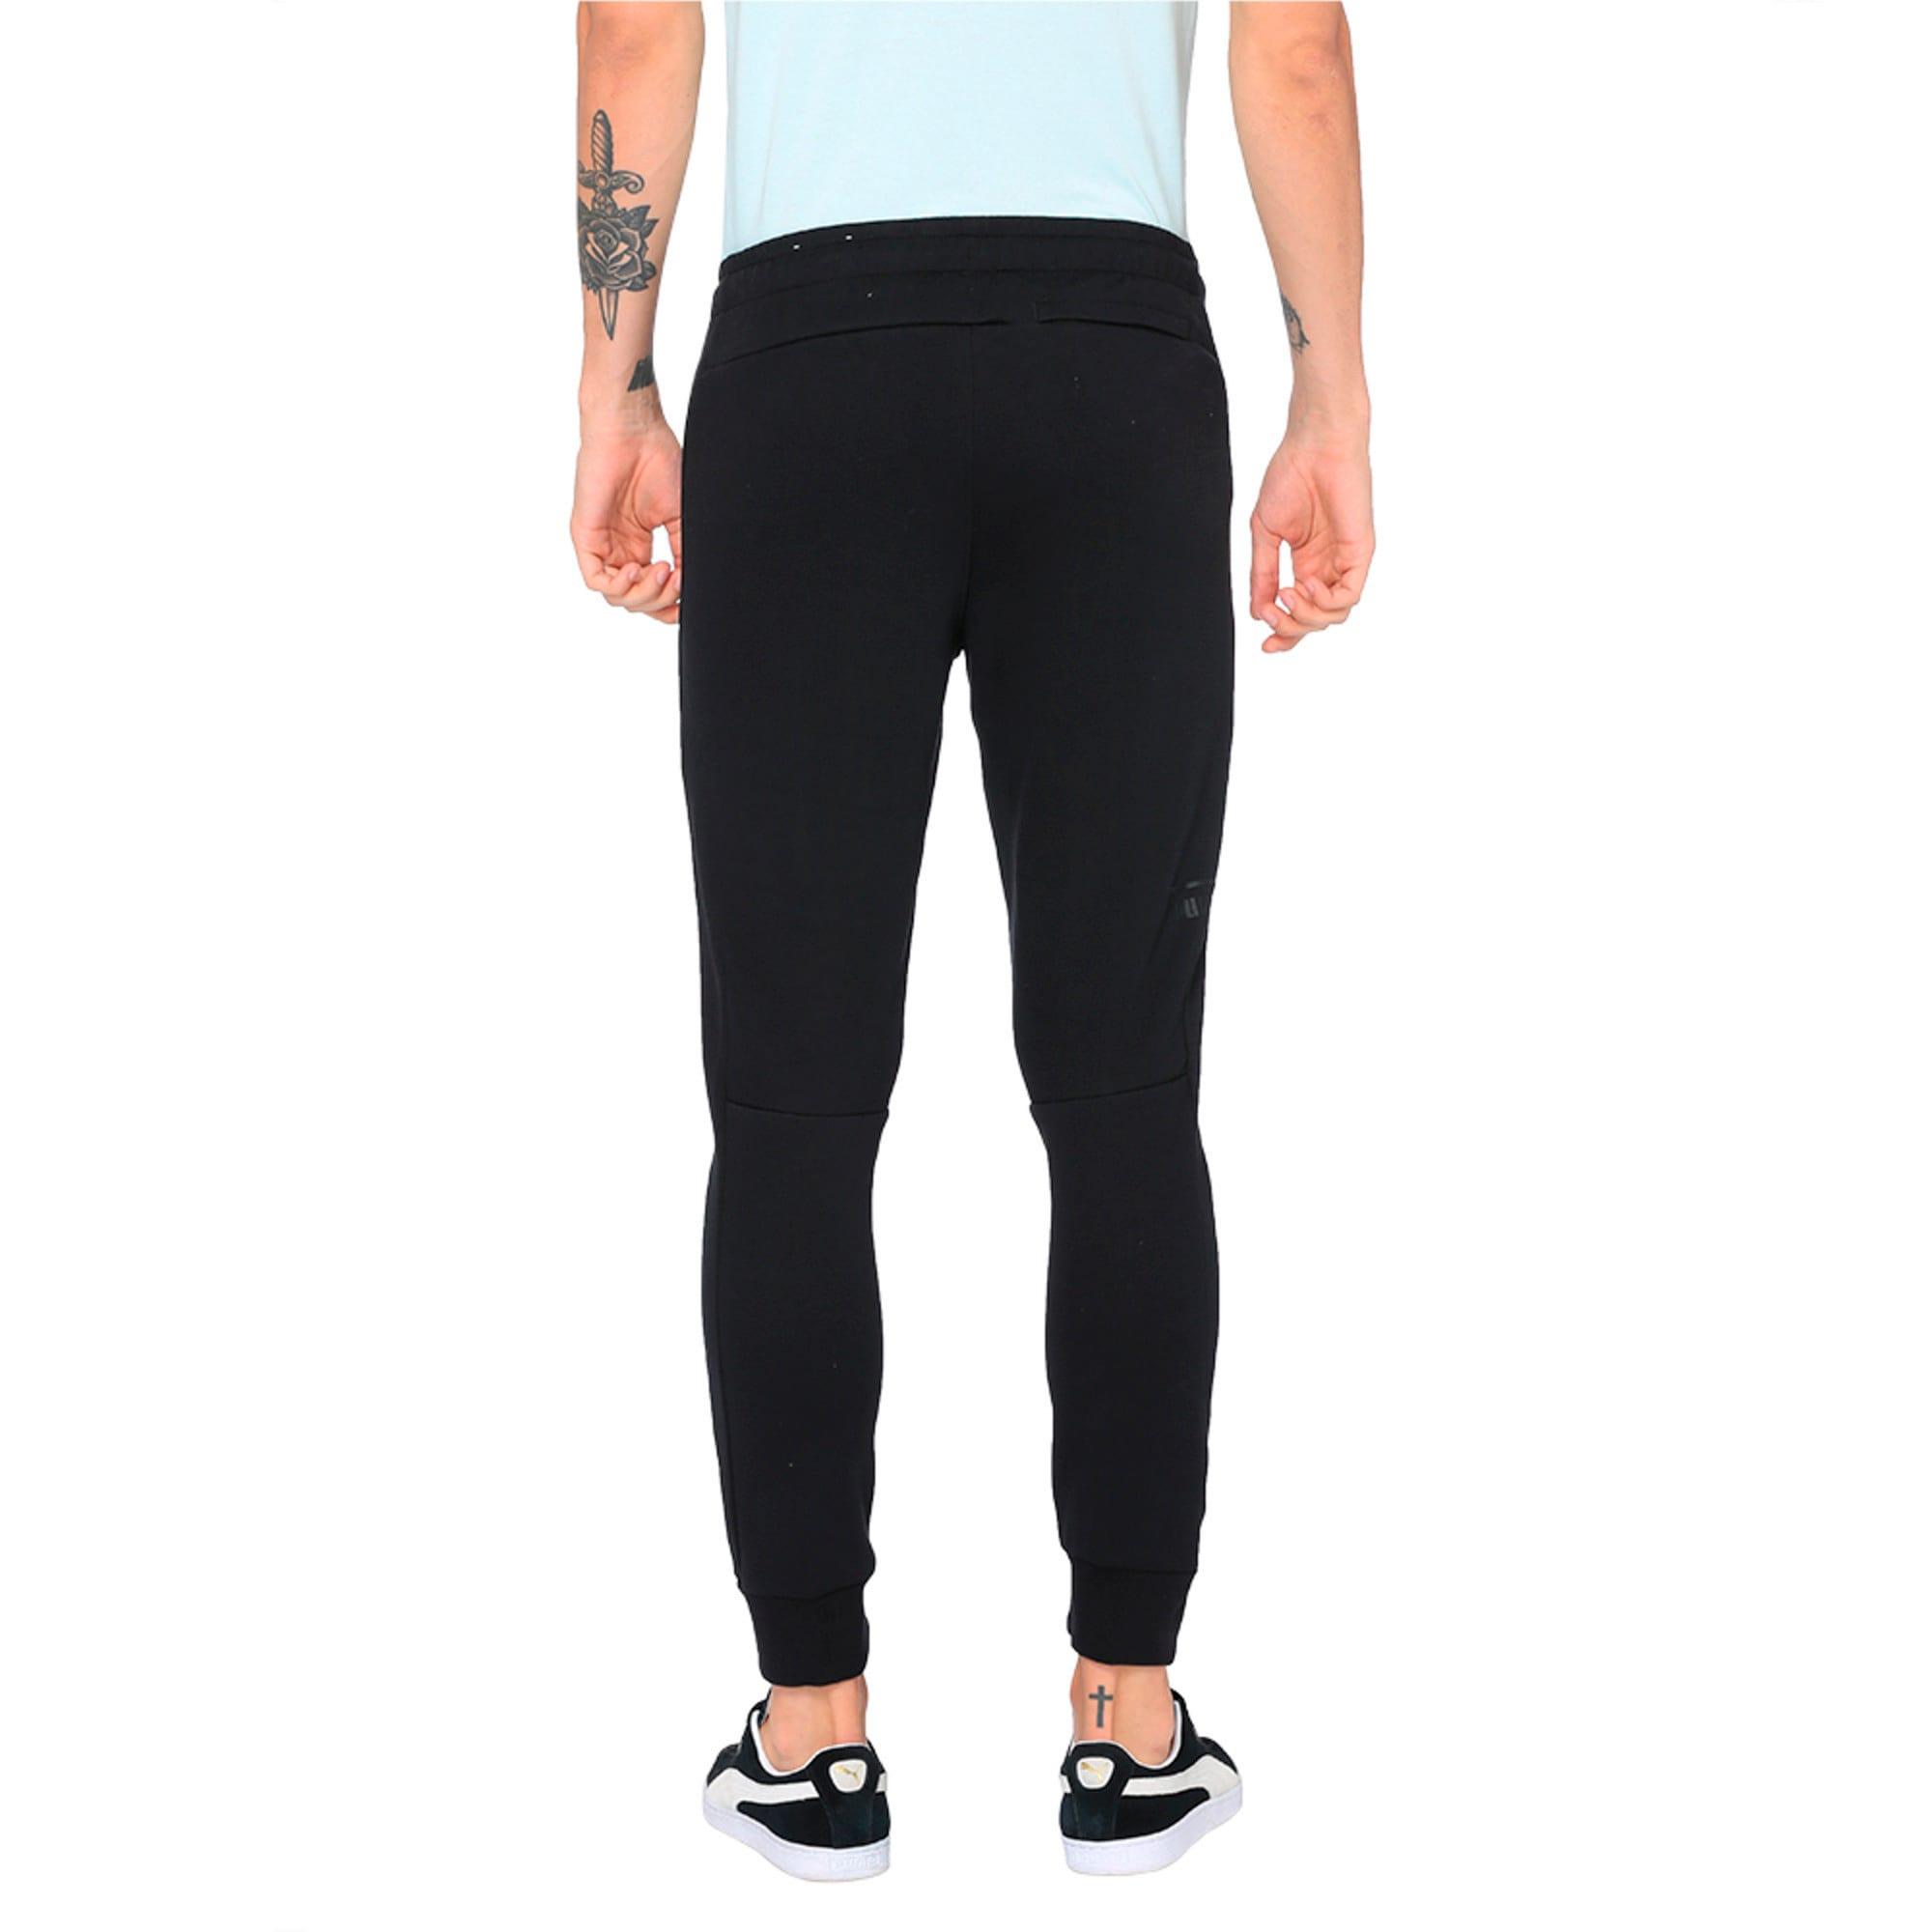 Thumbnail 2 of Pace Men's Sweatpants, Puma Black-1, medium-IND